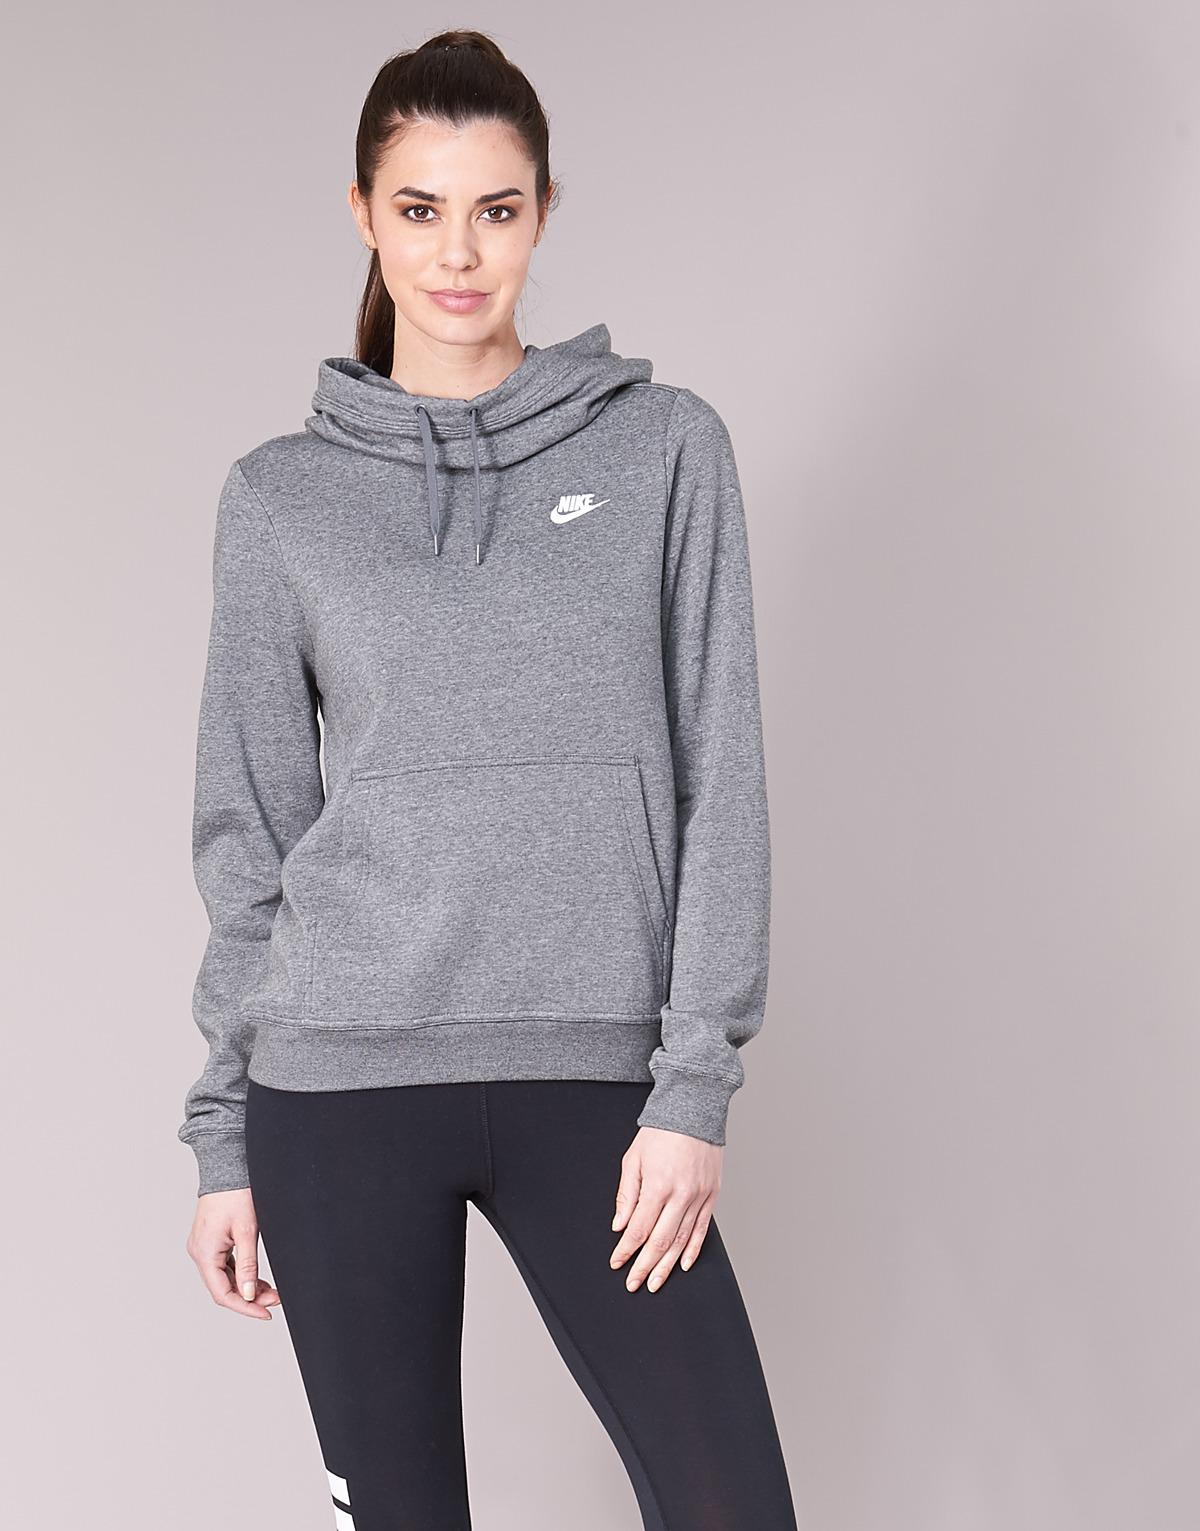 b42ab0feec75 Nike Funnel Fleece Sweatshirt in Gray - Save 8% - Lyst